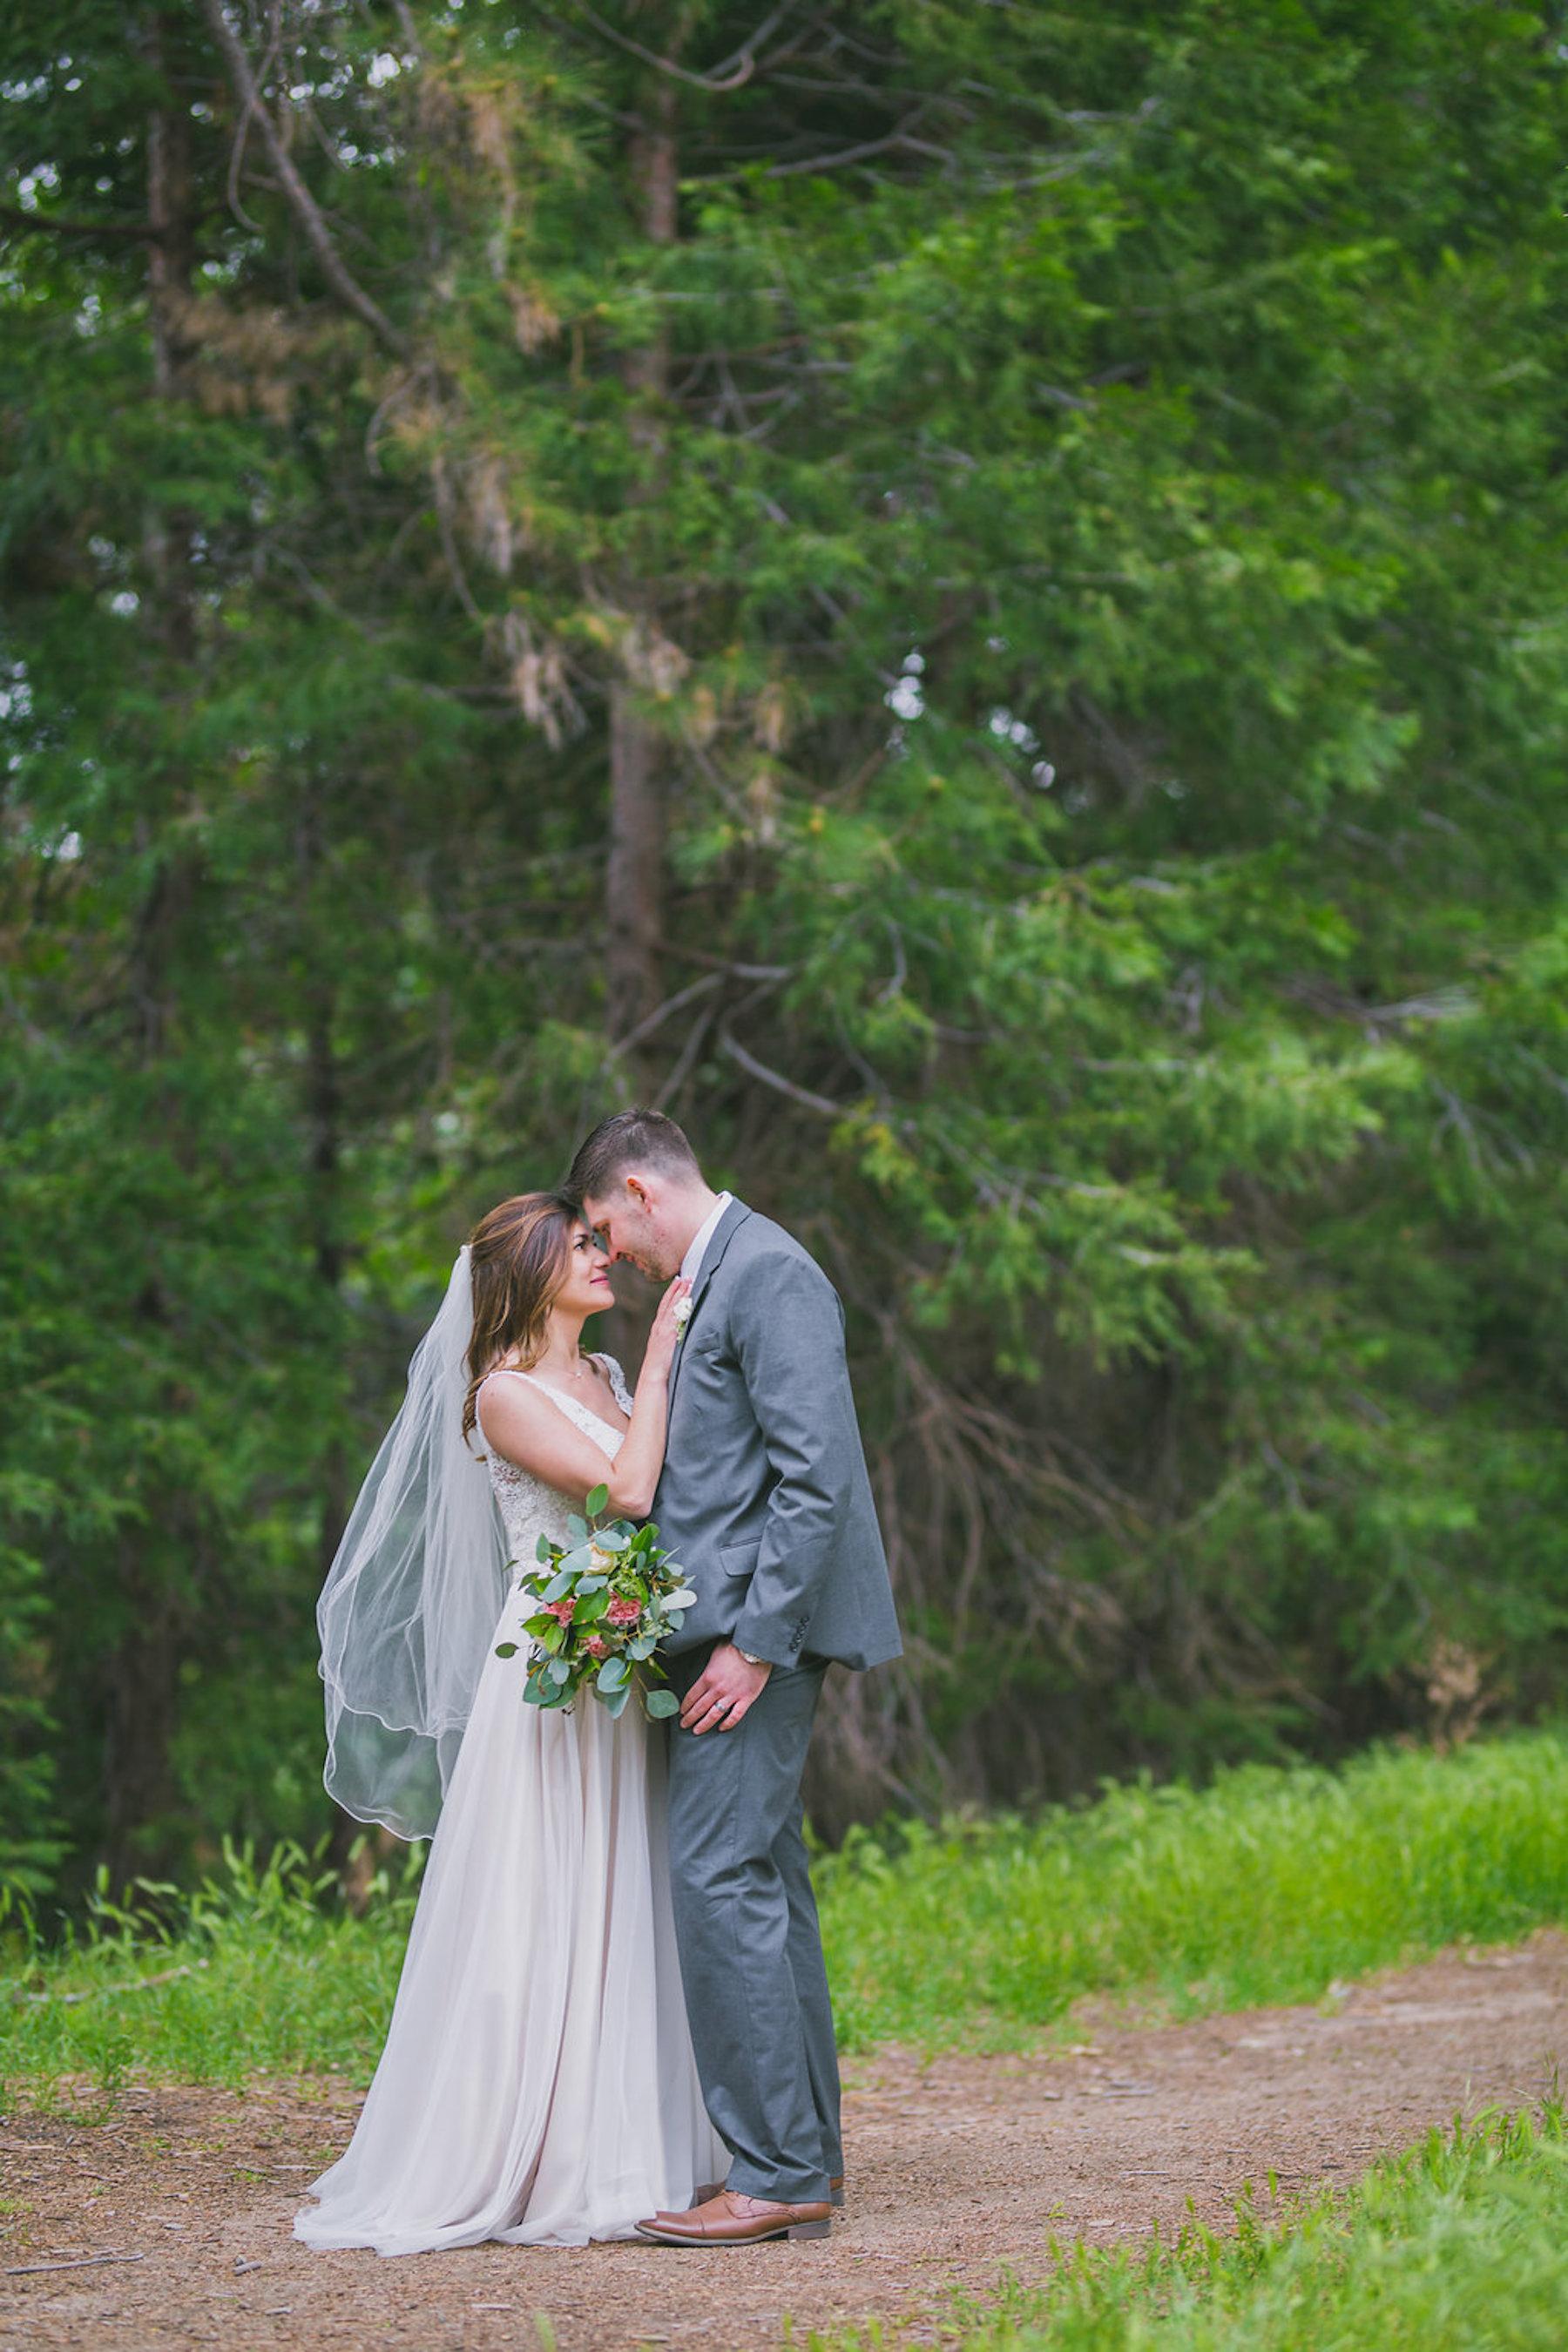 Alison & Jared: Venue- Thousand Pines, Crestline, Ca